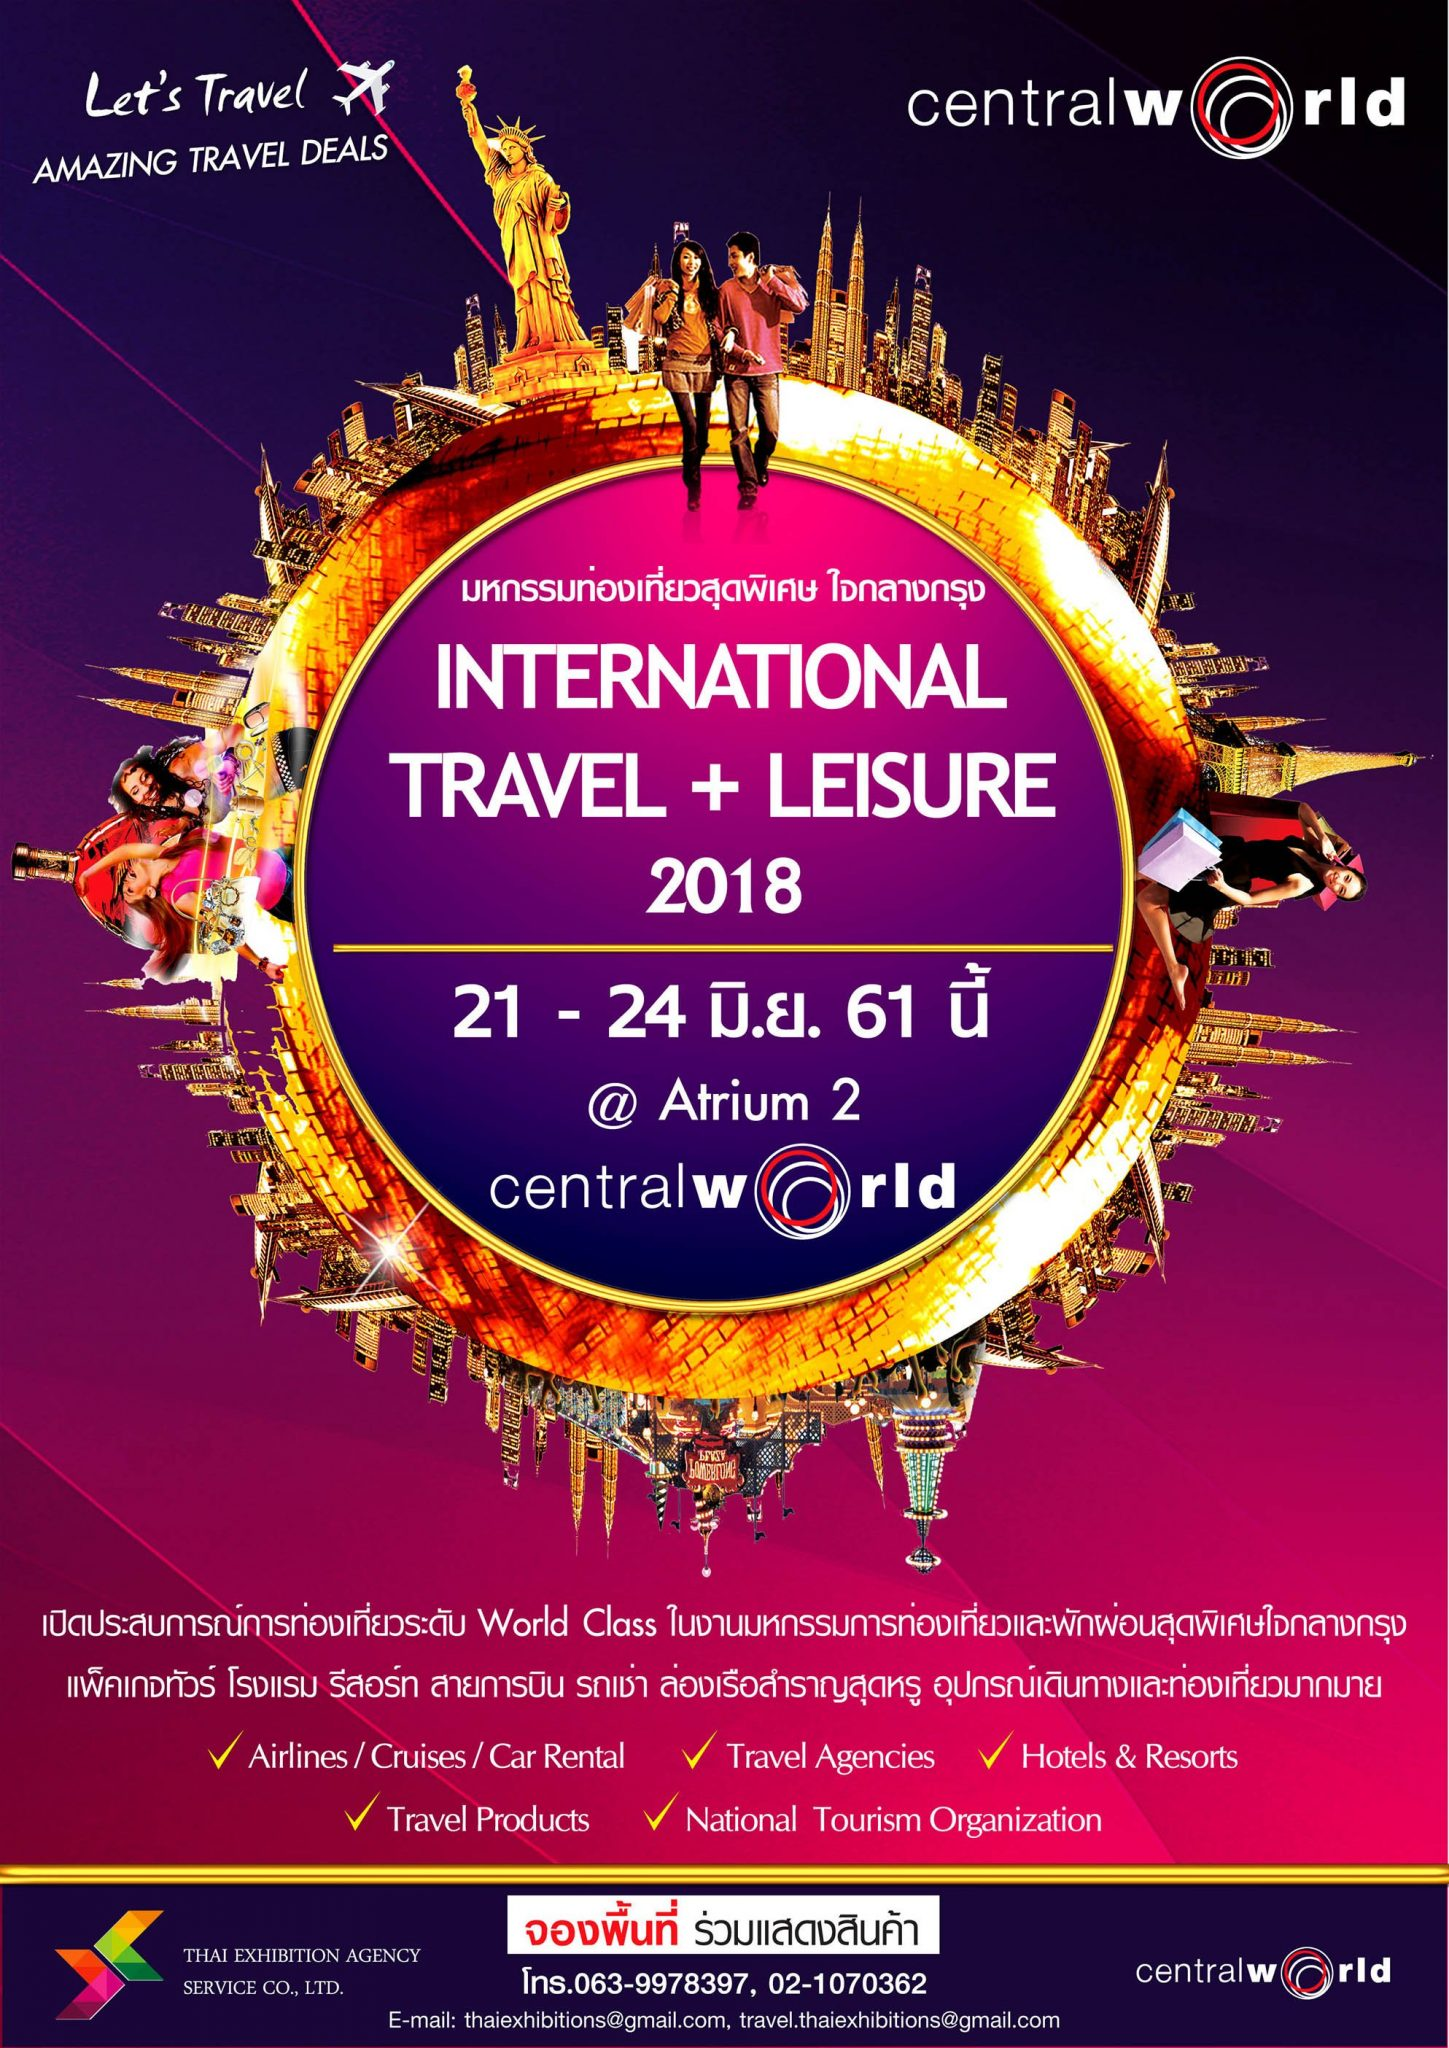 INTERNATIONAL TRAVEL + LEISURE 2018 มหกรรมท่องเที่ยวและพักผ่อนสุดพิเศษใจกลางกรุง 2 -